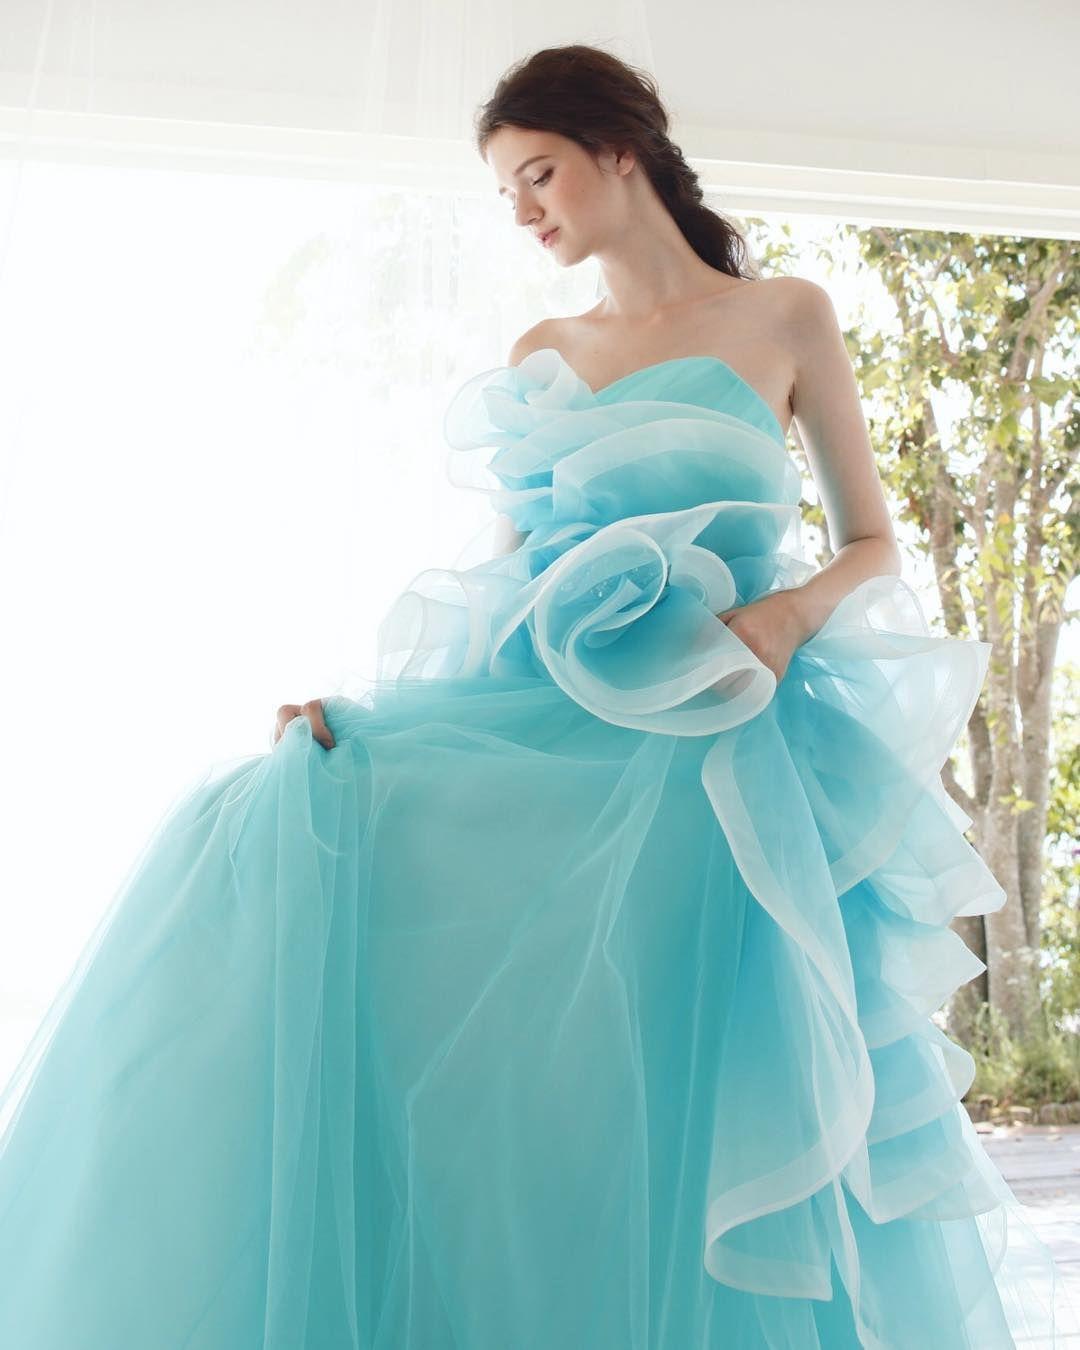 Wedding dresses lakeland fl  couturefashion couturedress weddingdress fashion ウェディング